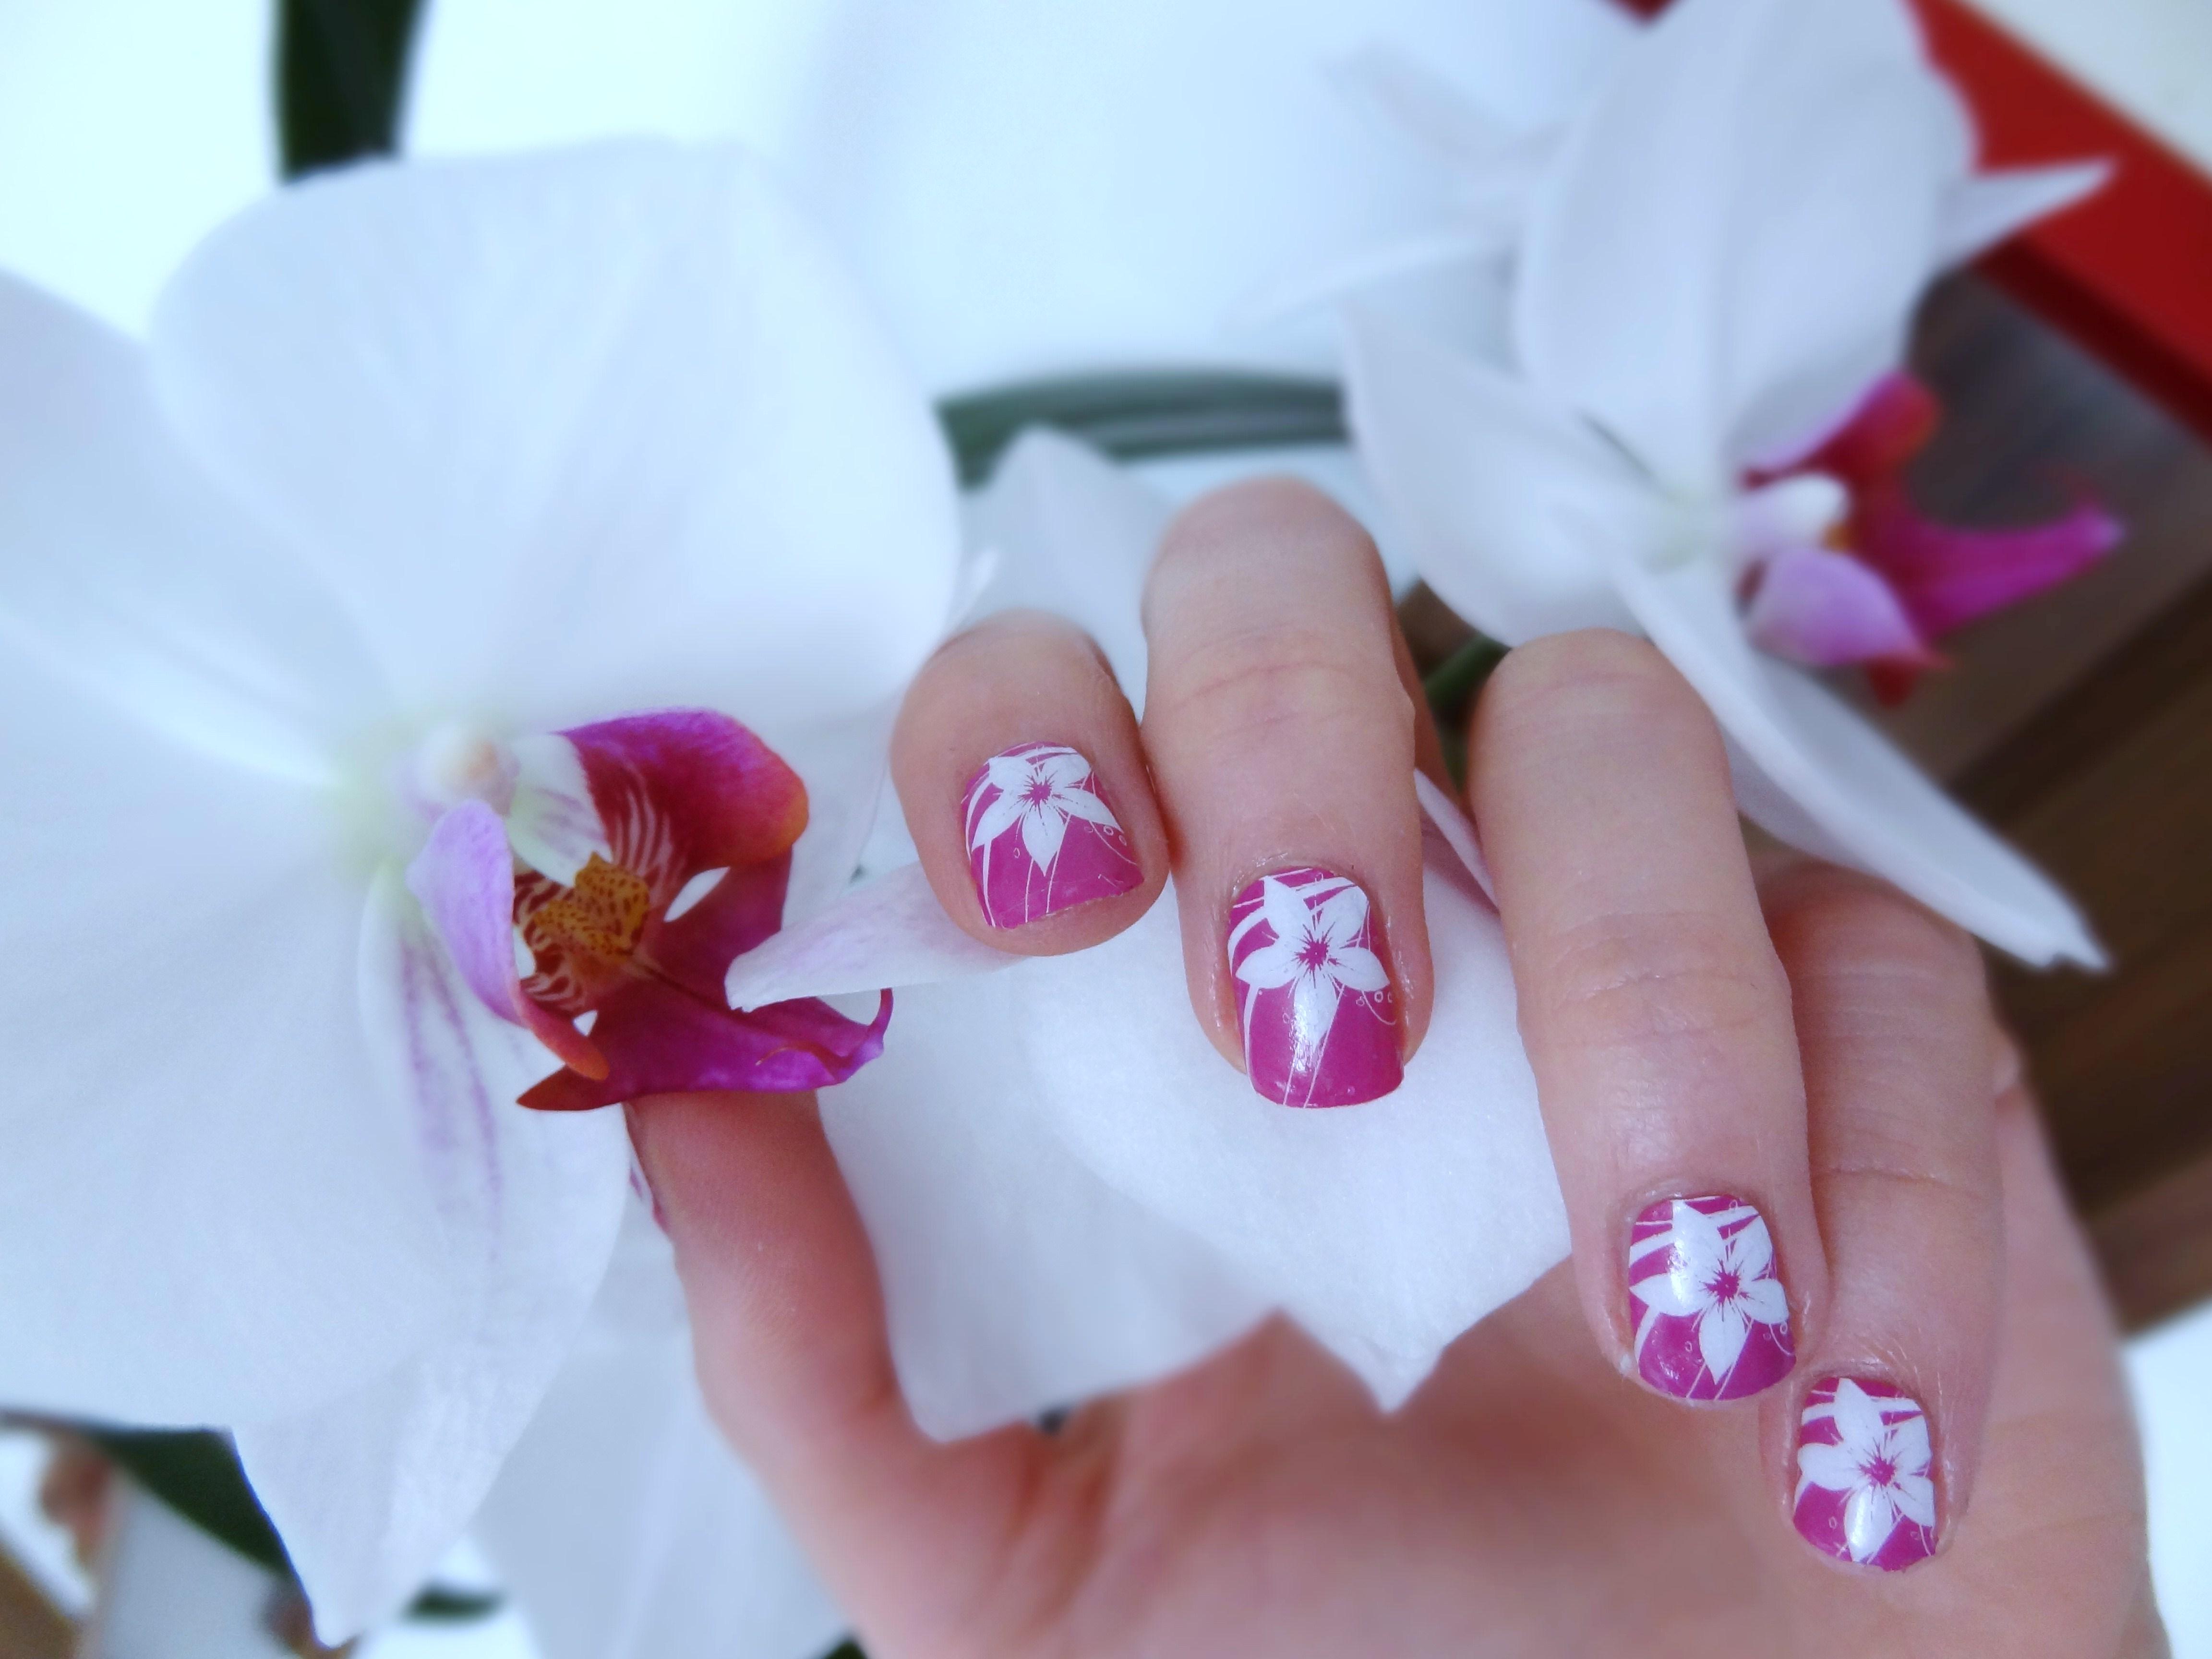 MISSLYN Nail Polish Strips | allerleibloggerei